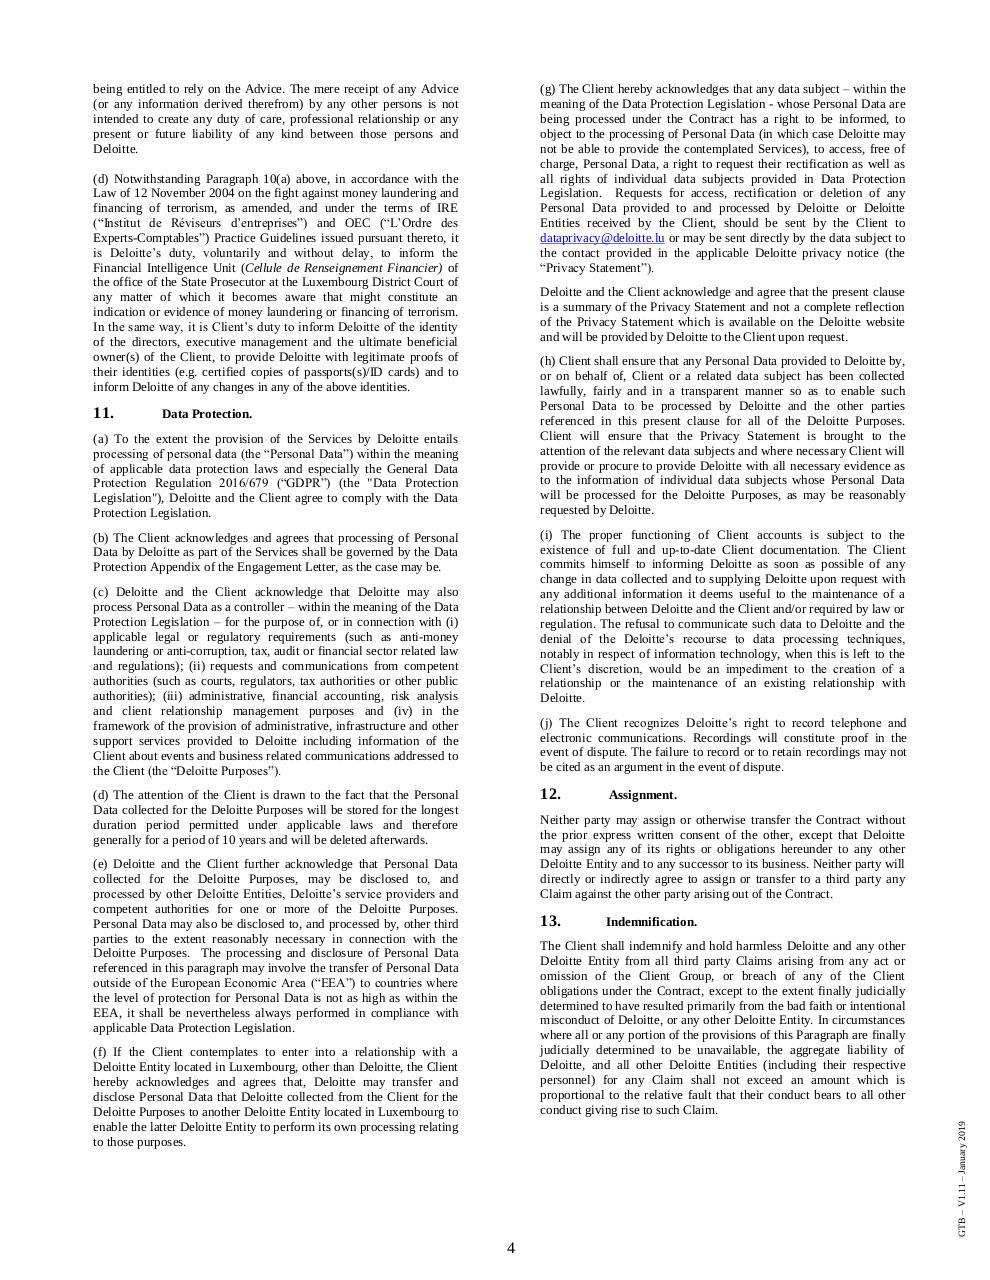 Easier to do Business With Version 2 par CARRUZZO - GTB-V1 11